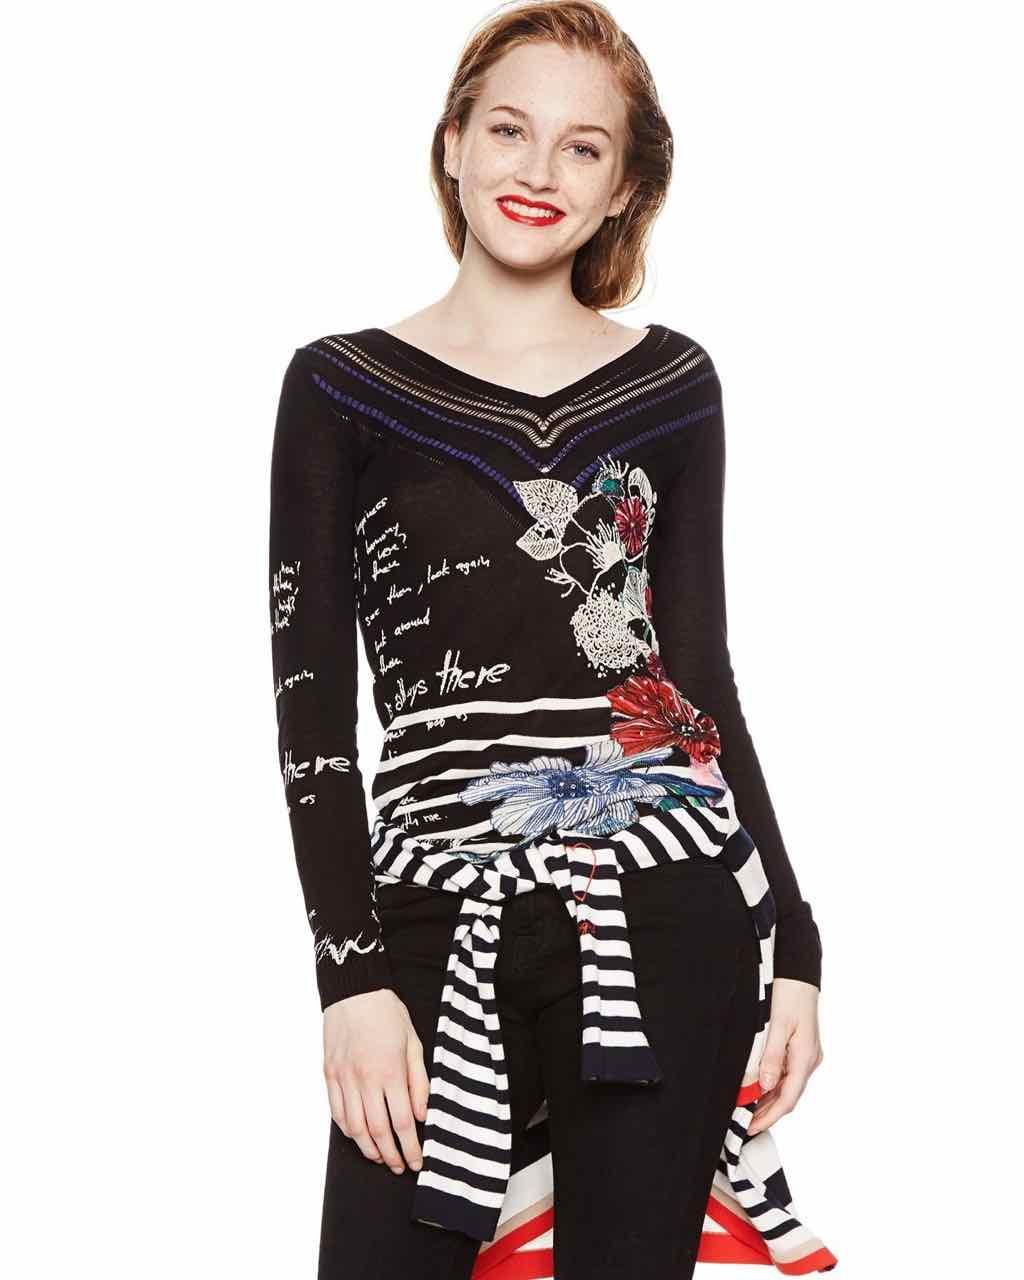 18SWJF69_2000 Desigual Sweater SYLVATICA Buy Online